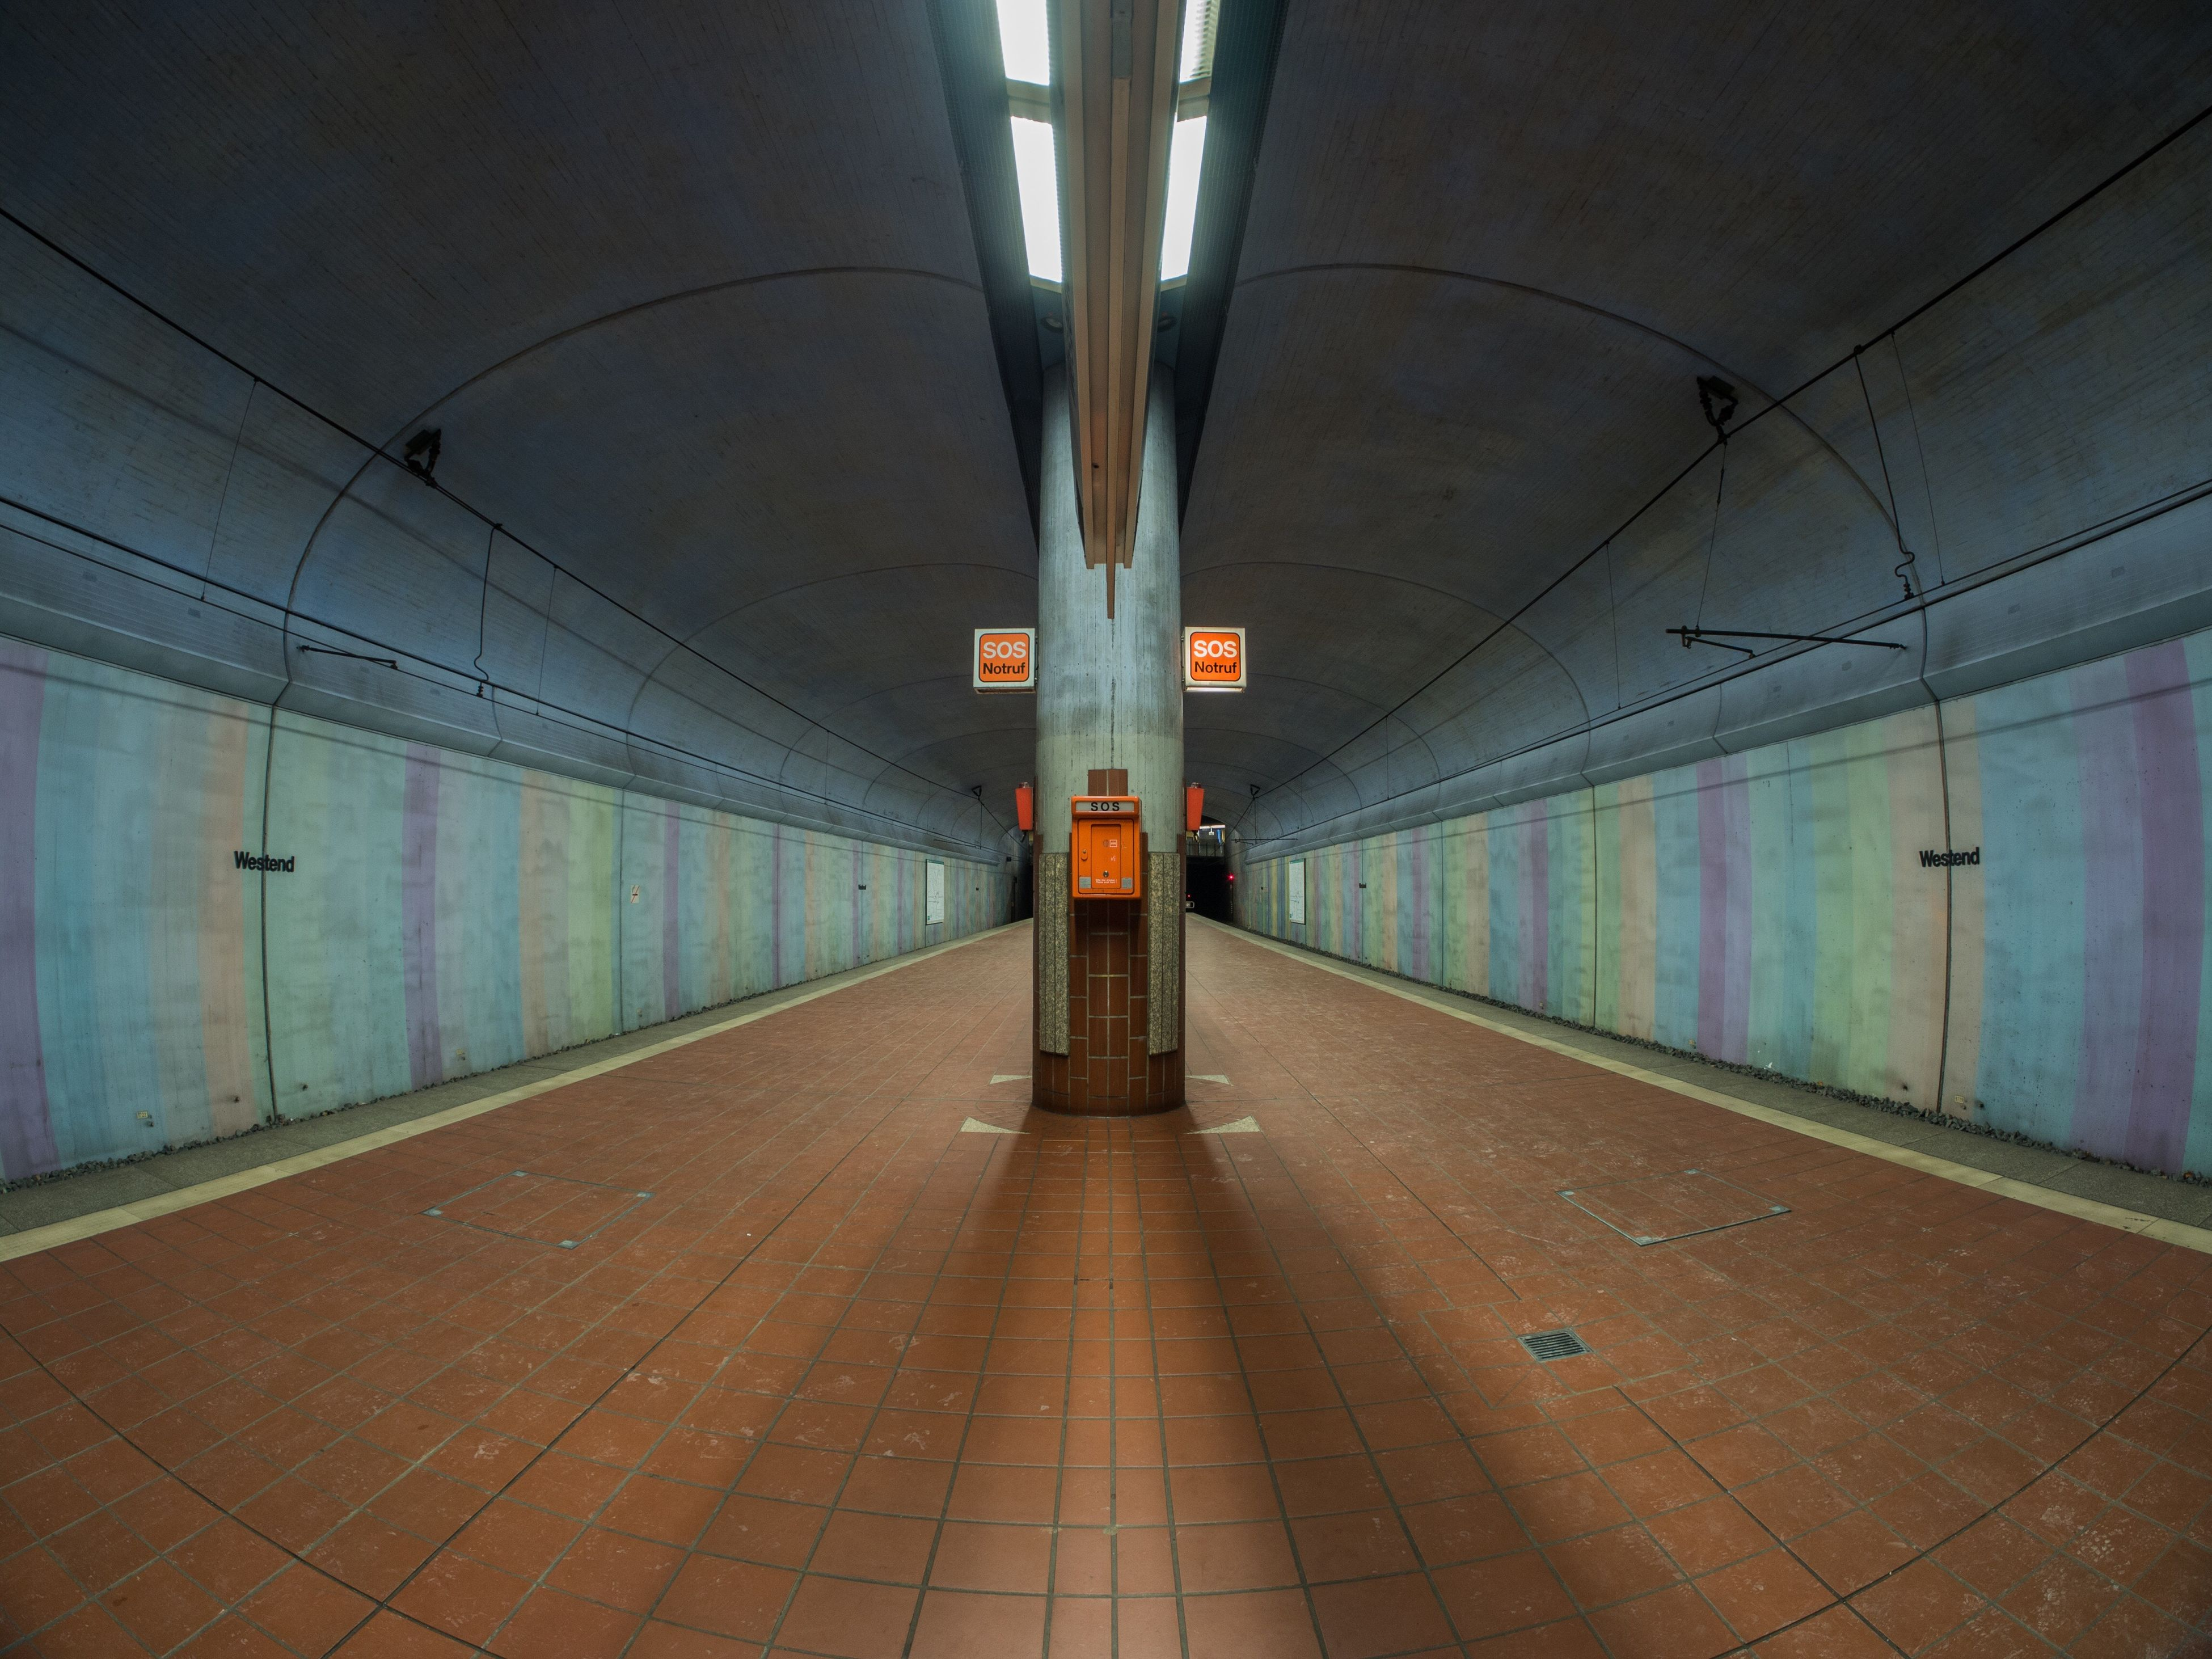 Waiting 🚉 Indoors  Illuminated Architecture Built Structure No People Day Tunnel Tube Metro Subway Frankfurt Underground Art Abstract Architecture Railroad Station